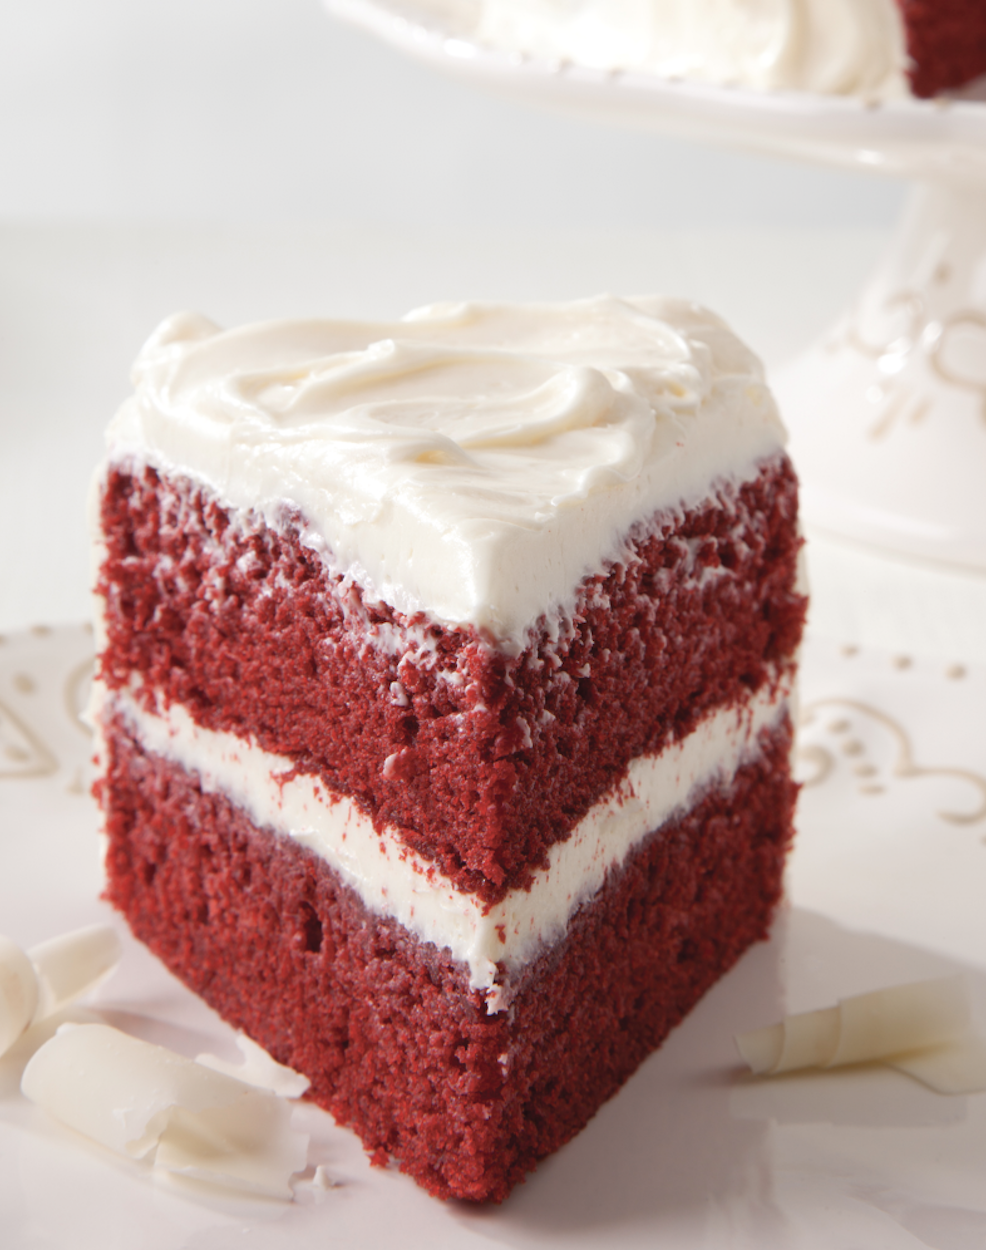 Red Velvet Cake with Vanilla Cream Cheese Frosting